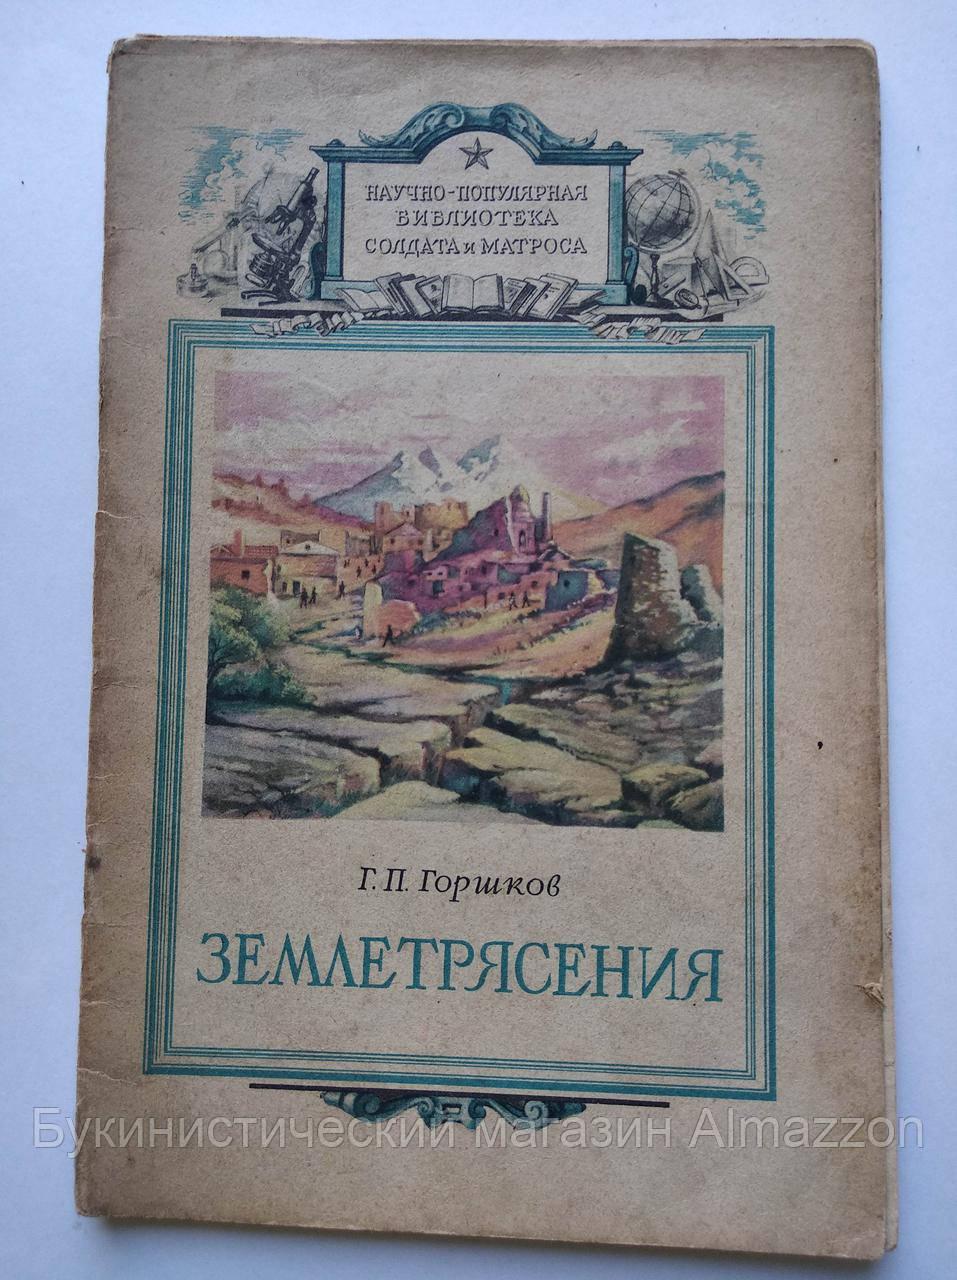 Г.Горшков Землетрясения 1947 год. Серия: Научно-популярная библиотека солдата и матроса